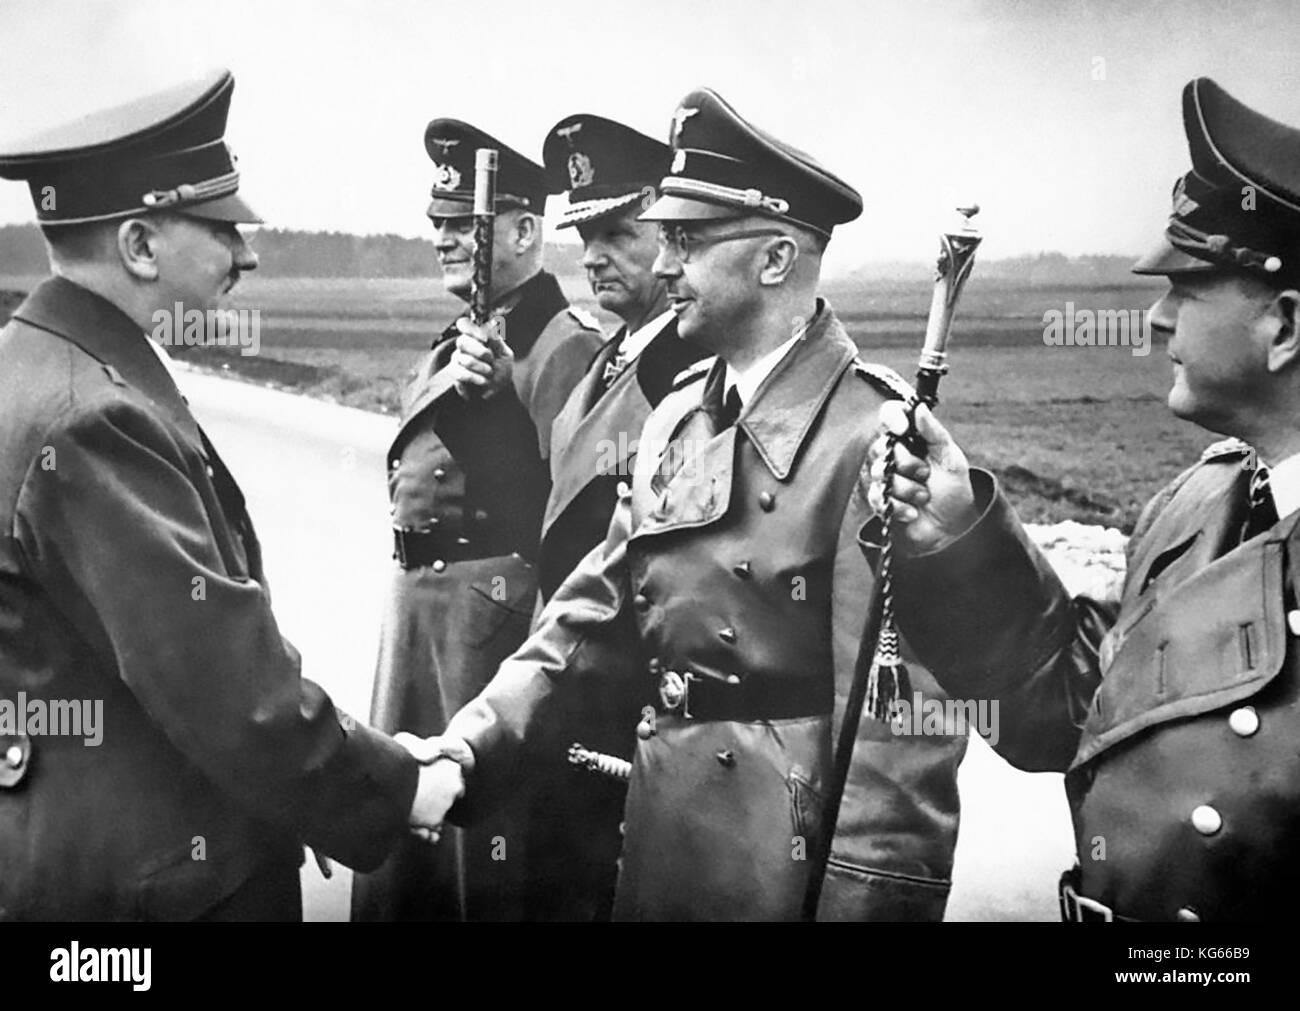 ADOLF HITLER at left with from left: Field Marshal Wilhelm Keitel, Admiral Karl Doenitz, Heinrich Himmler, Field - Stock Image